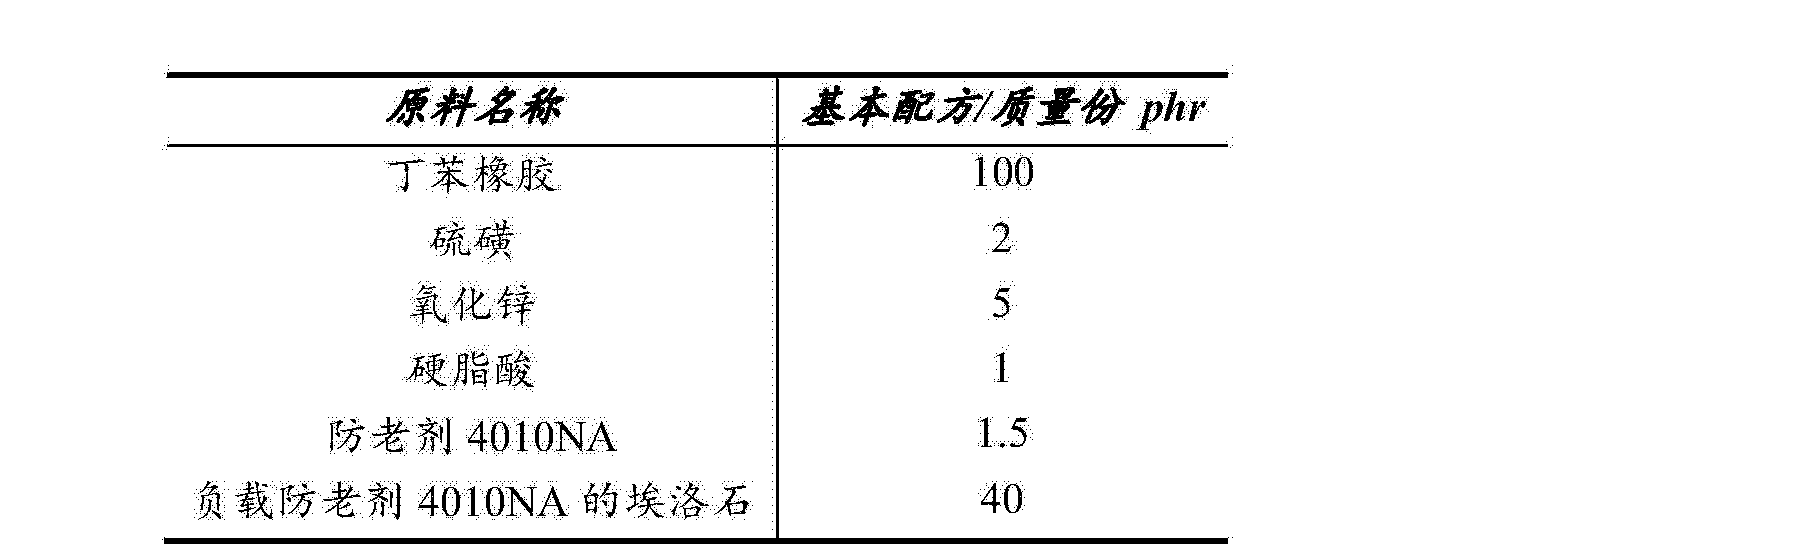 Figure CN104877178AD00051